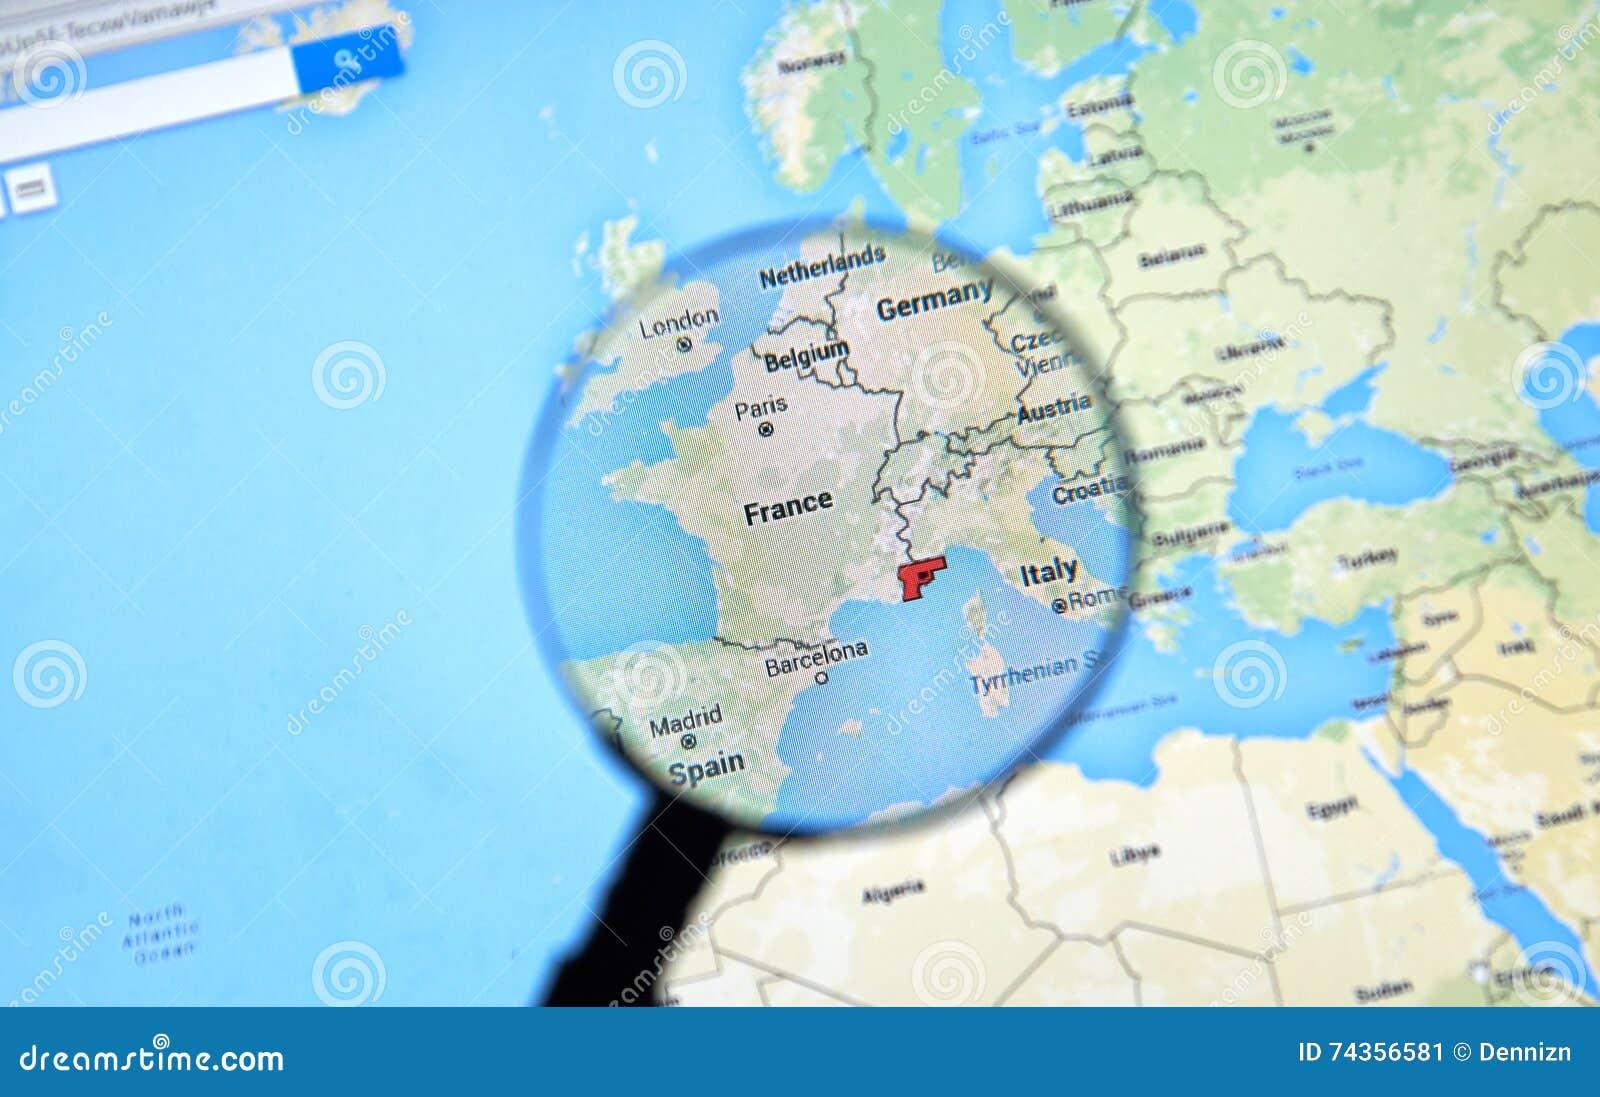 Nice, France On Google Maps Editorial Photo - Image of communication ...